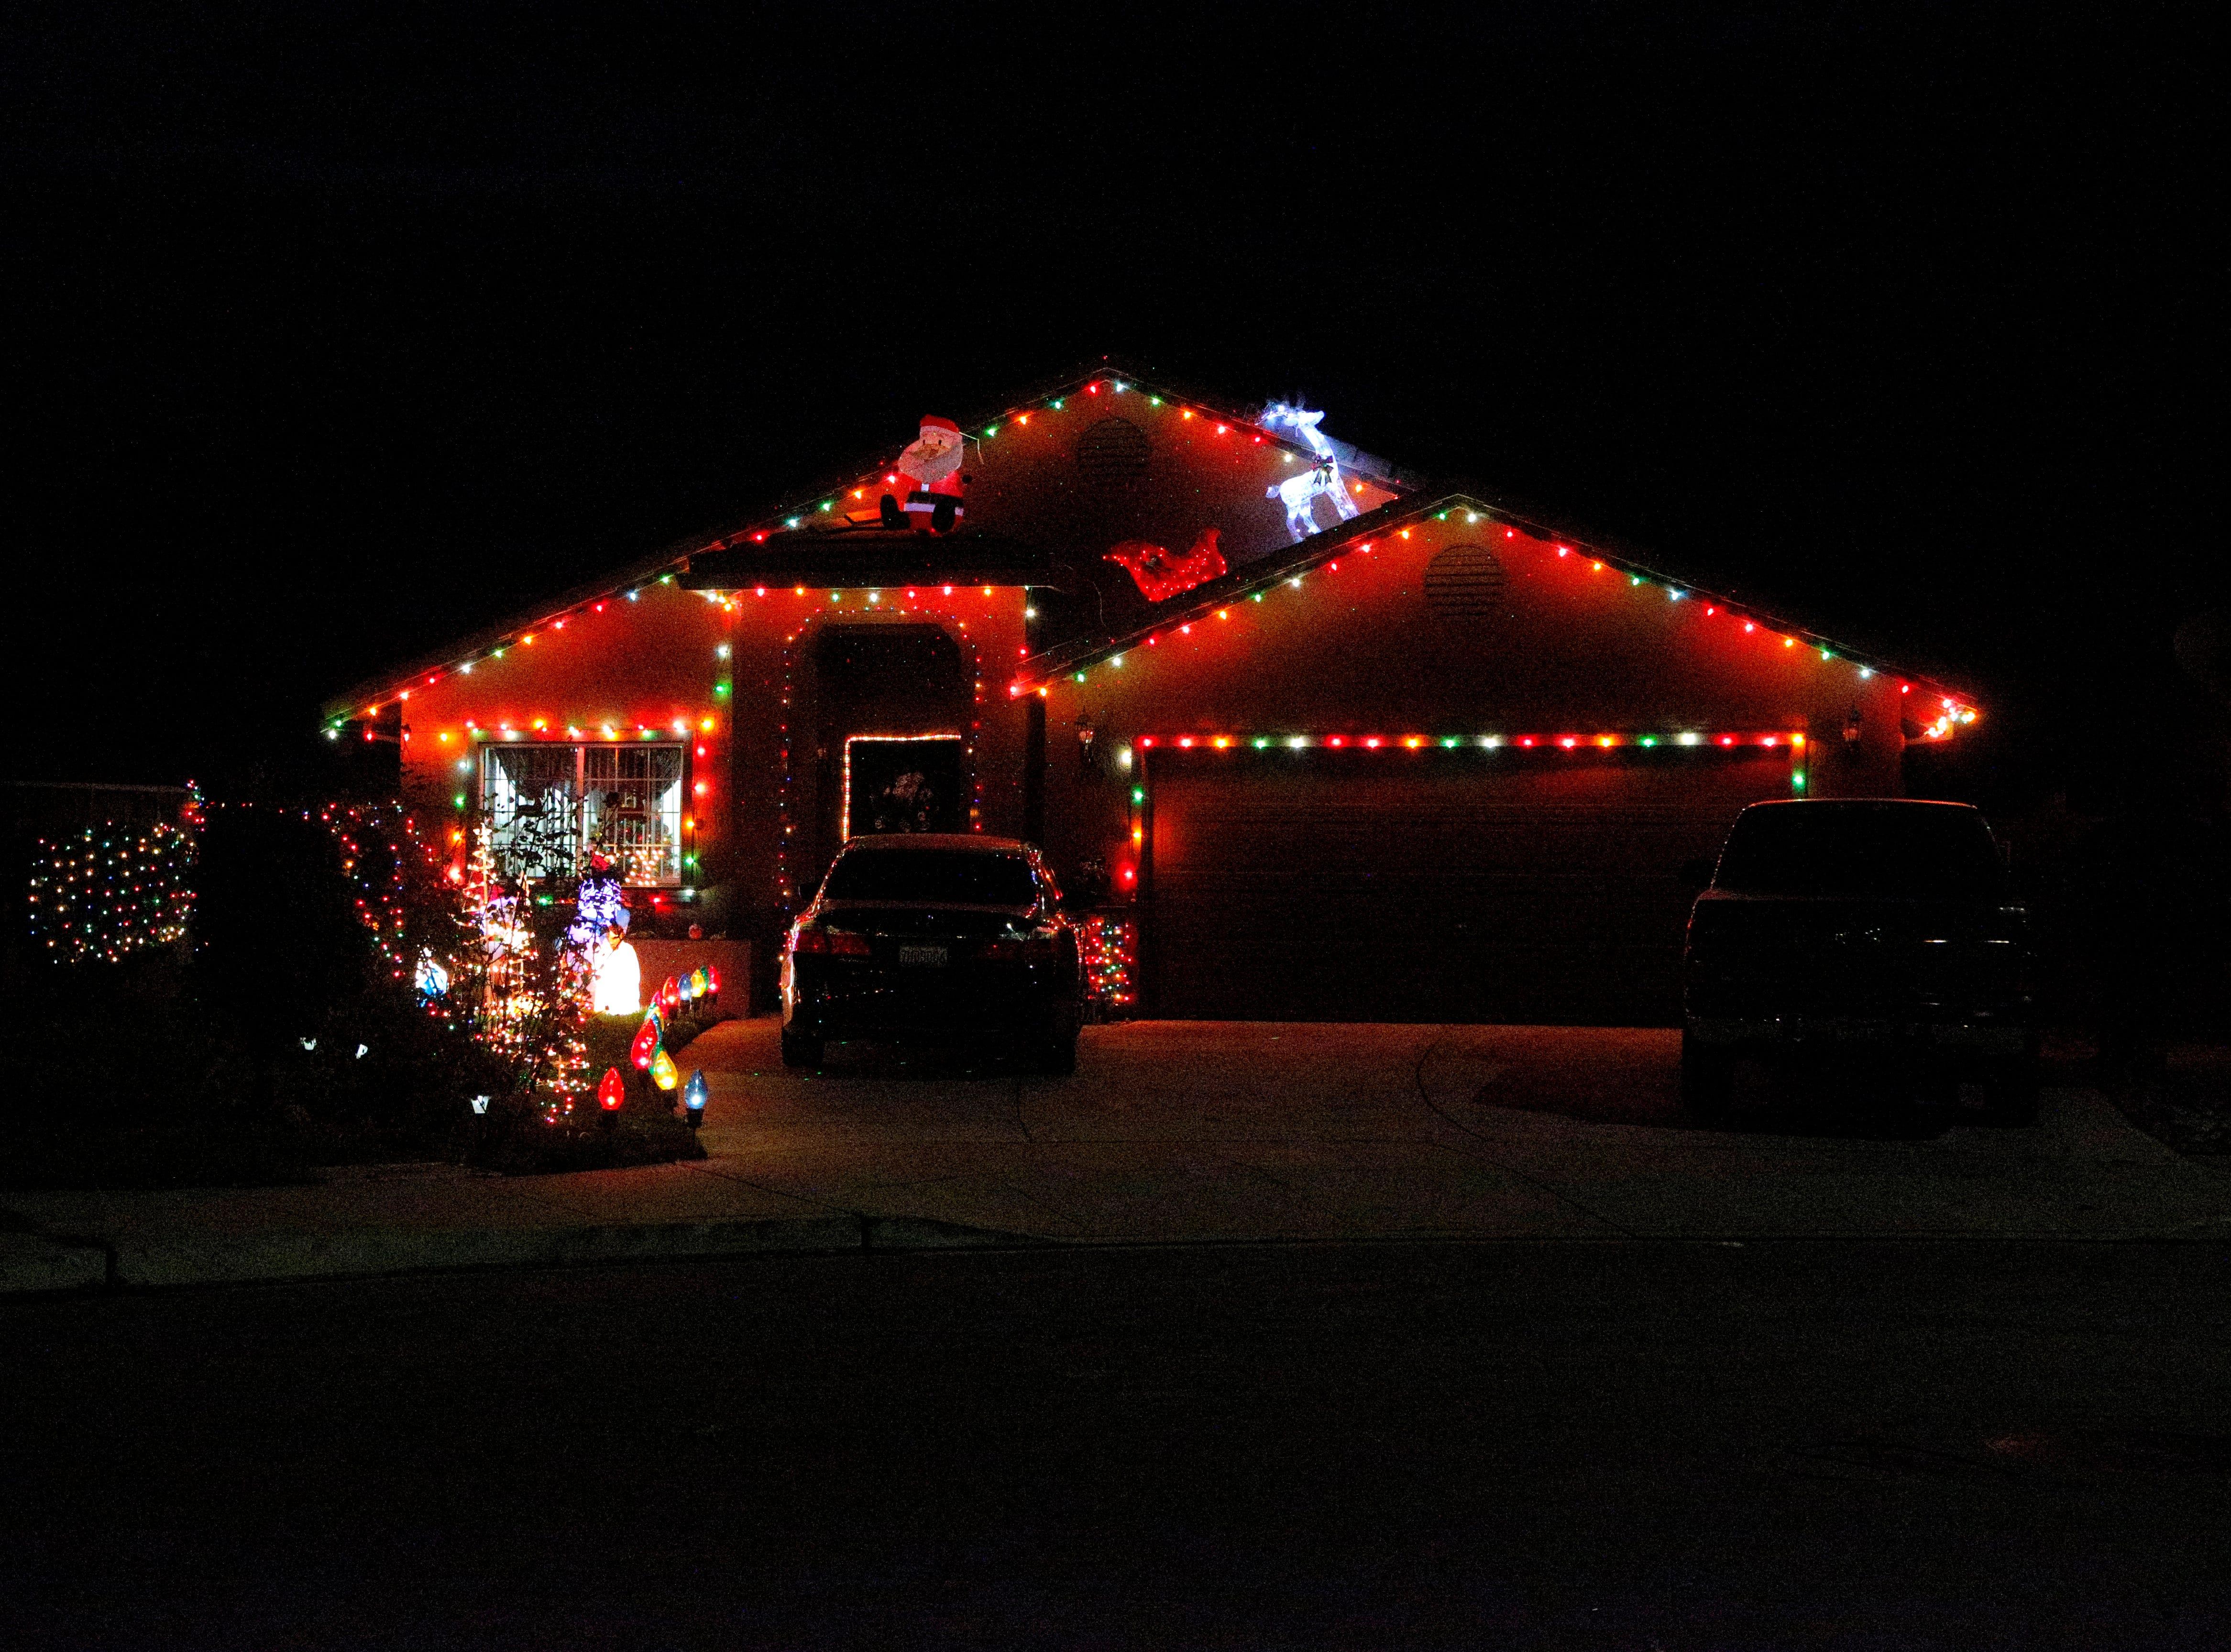 1557 Cougar Drive in Salinas